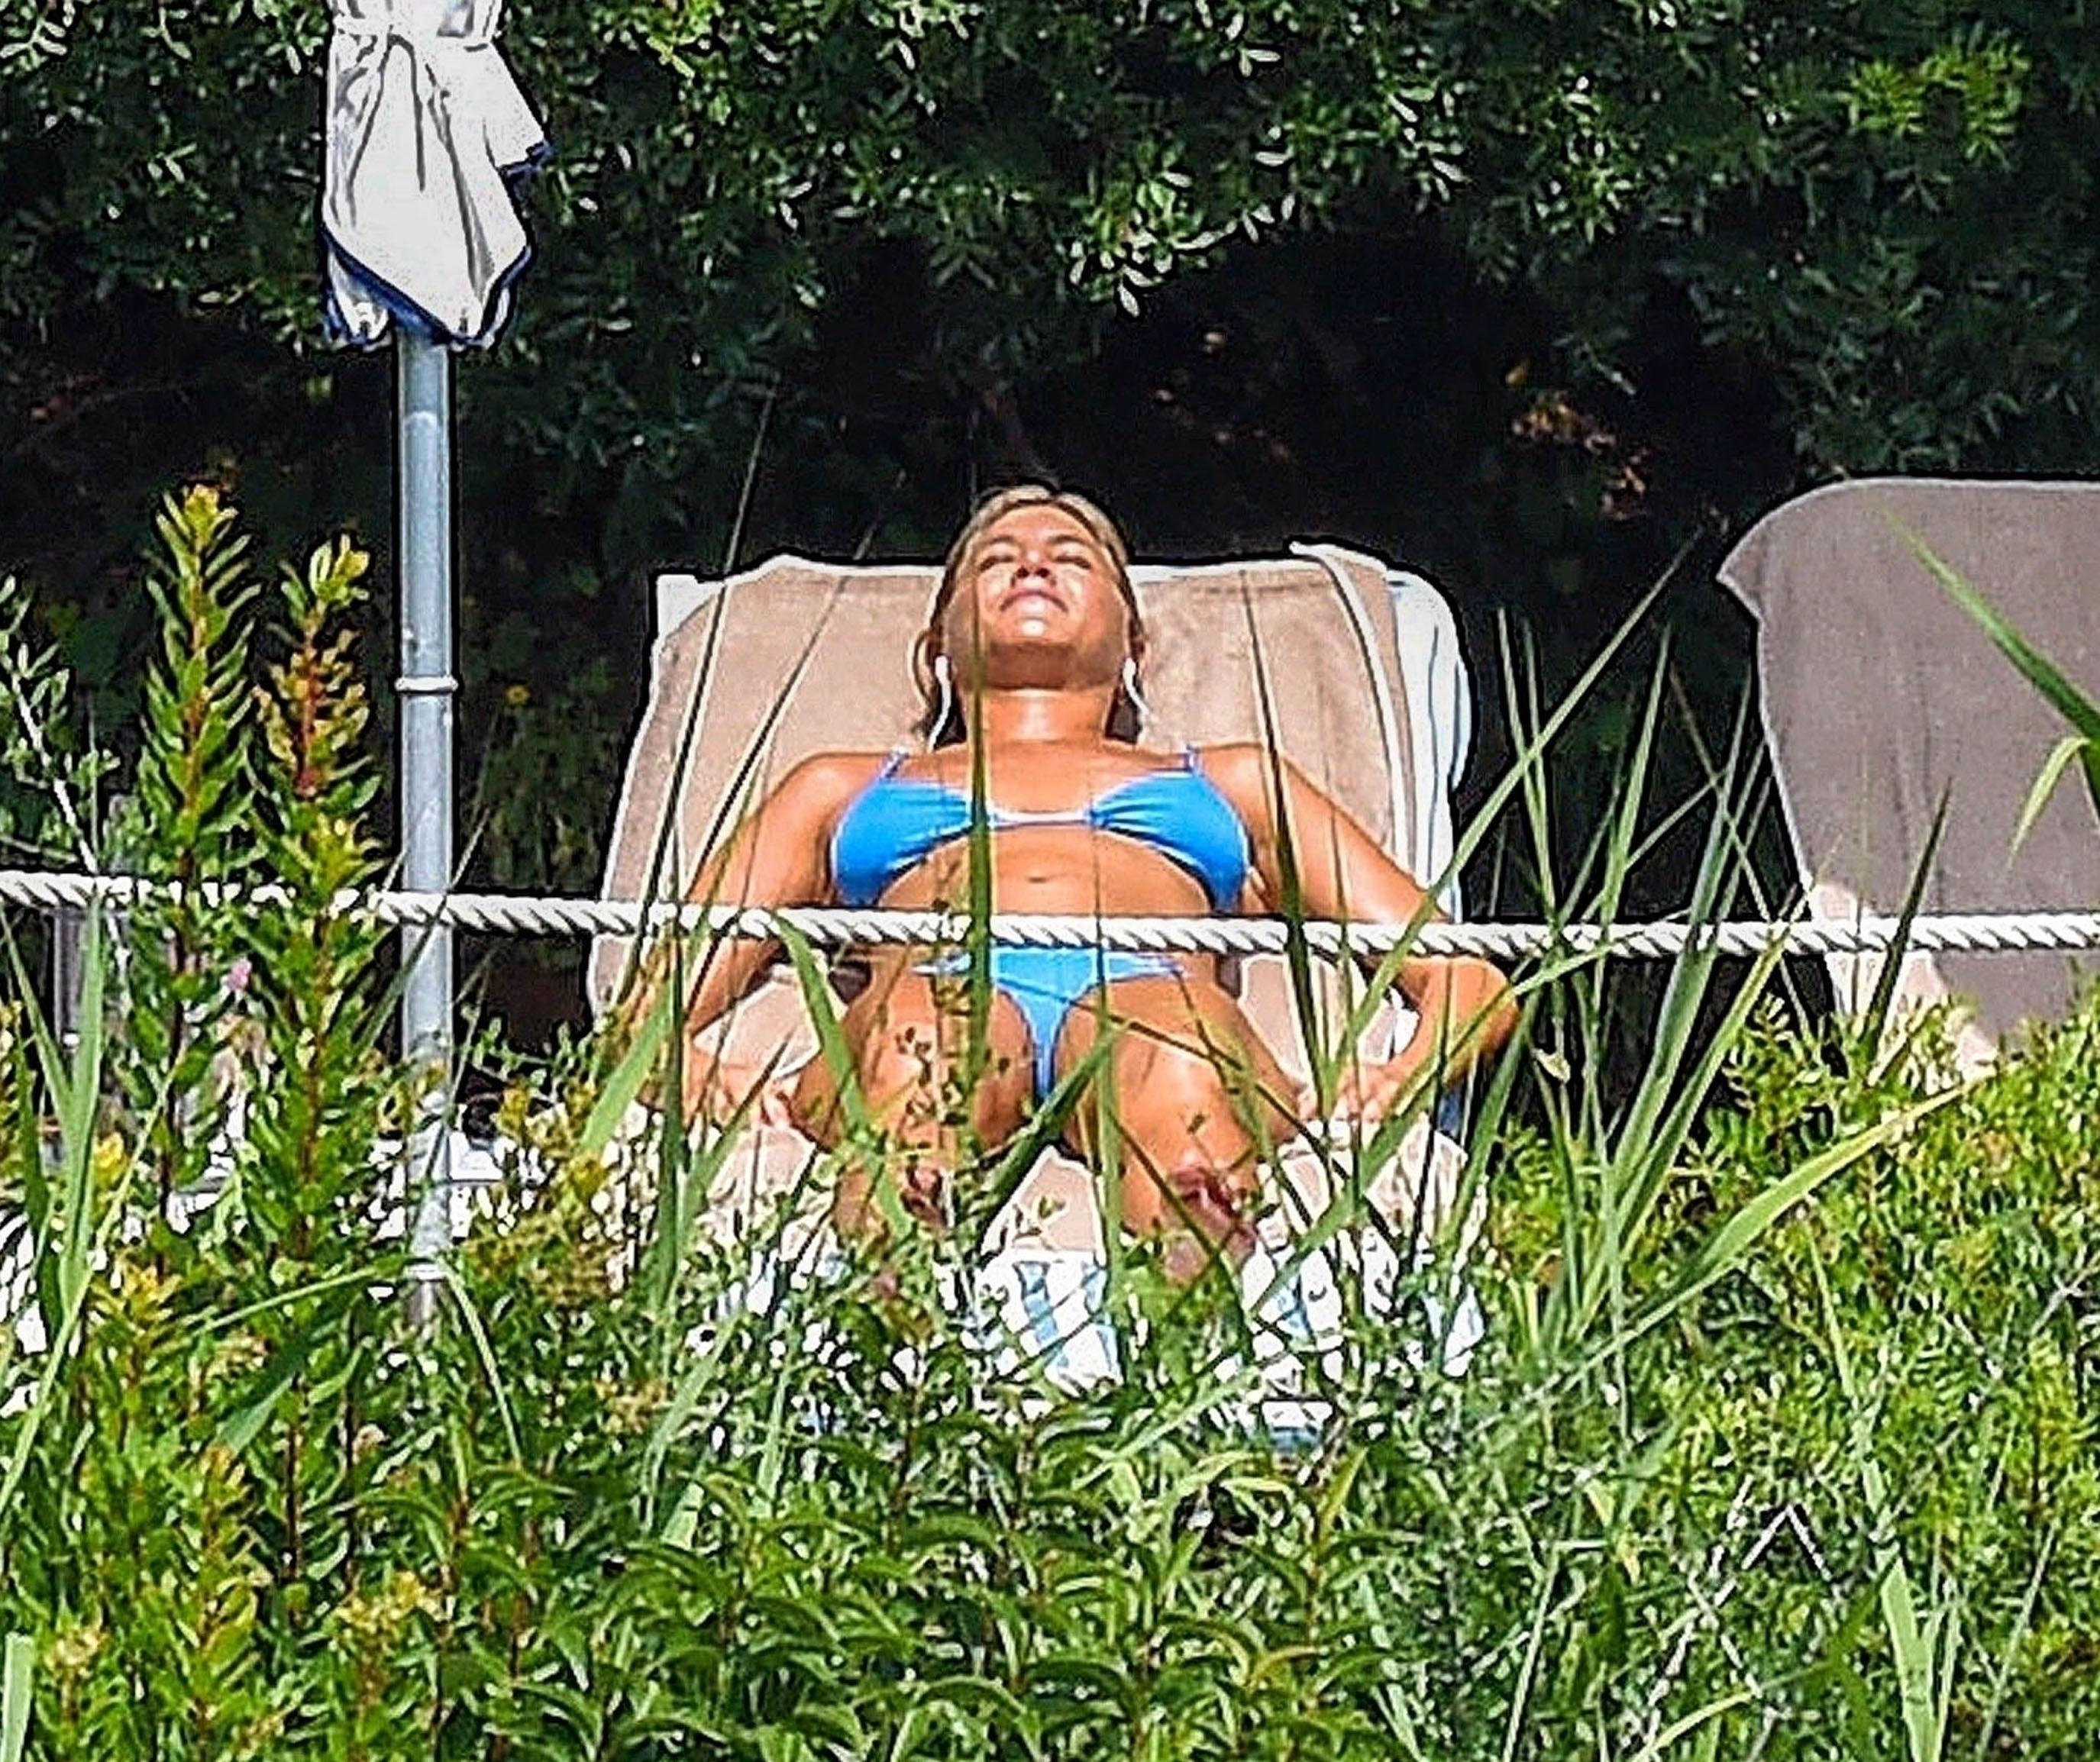 Jennifer Aniston Bikini girlfappening.com 1